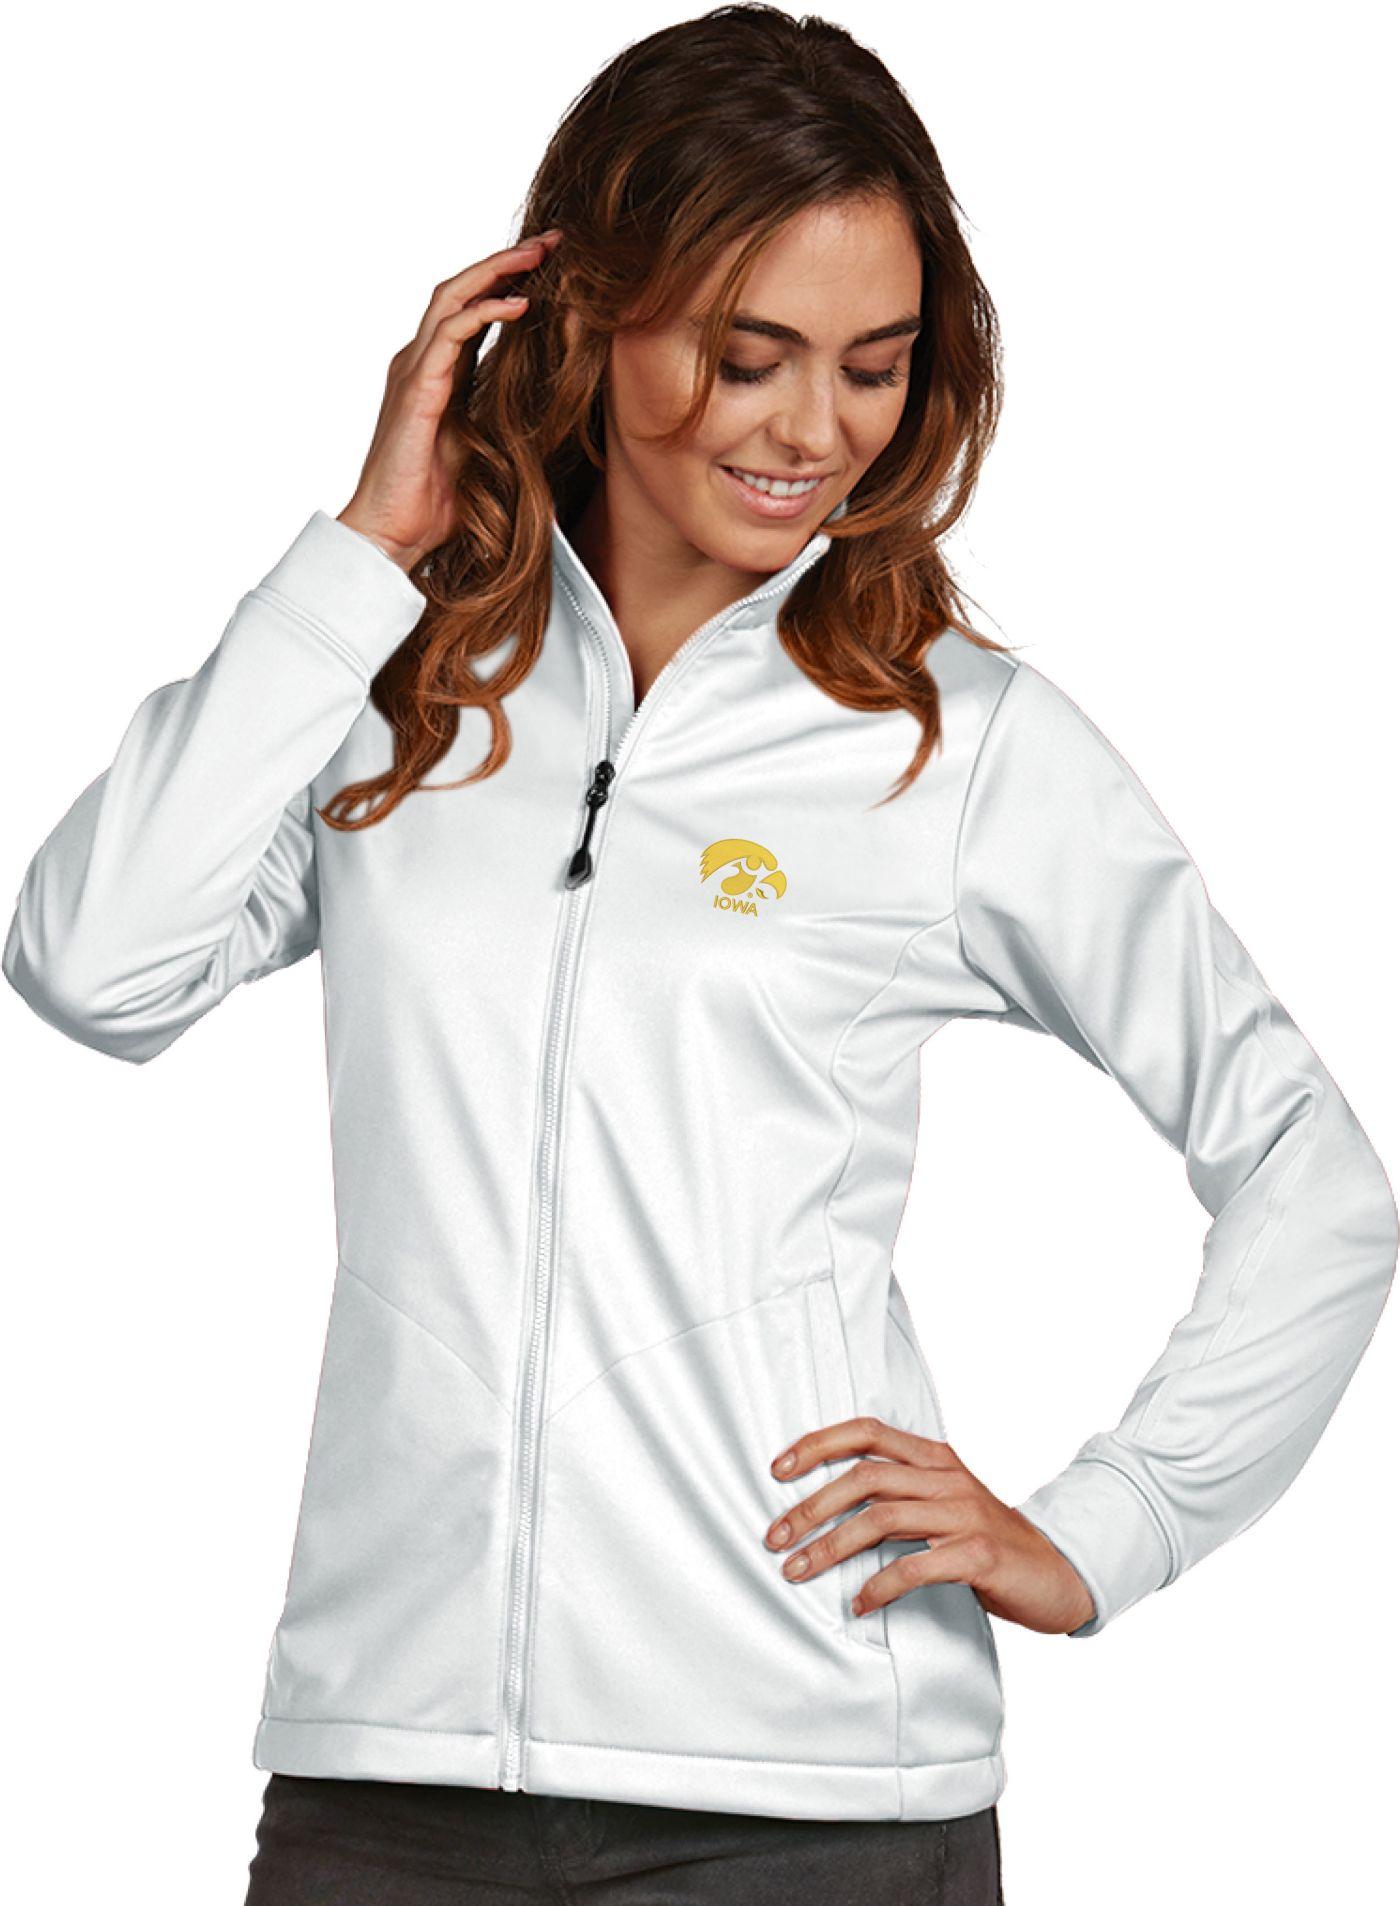 Antigua Women's Iowa Hawkeyes White Performance Golf Jacket